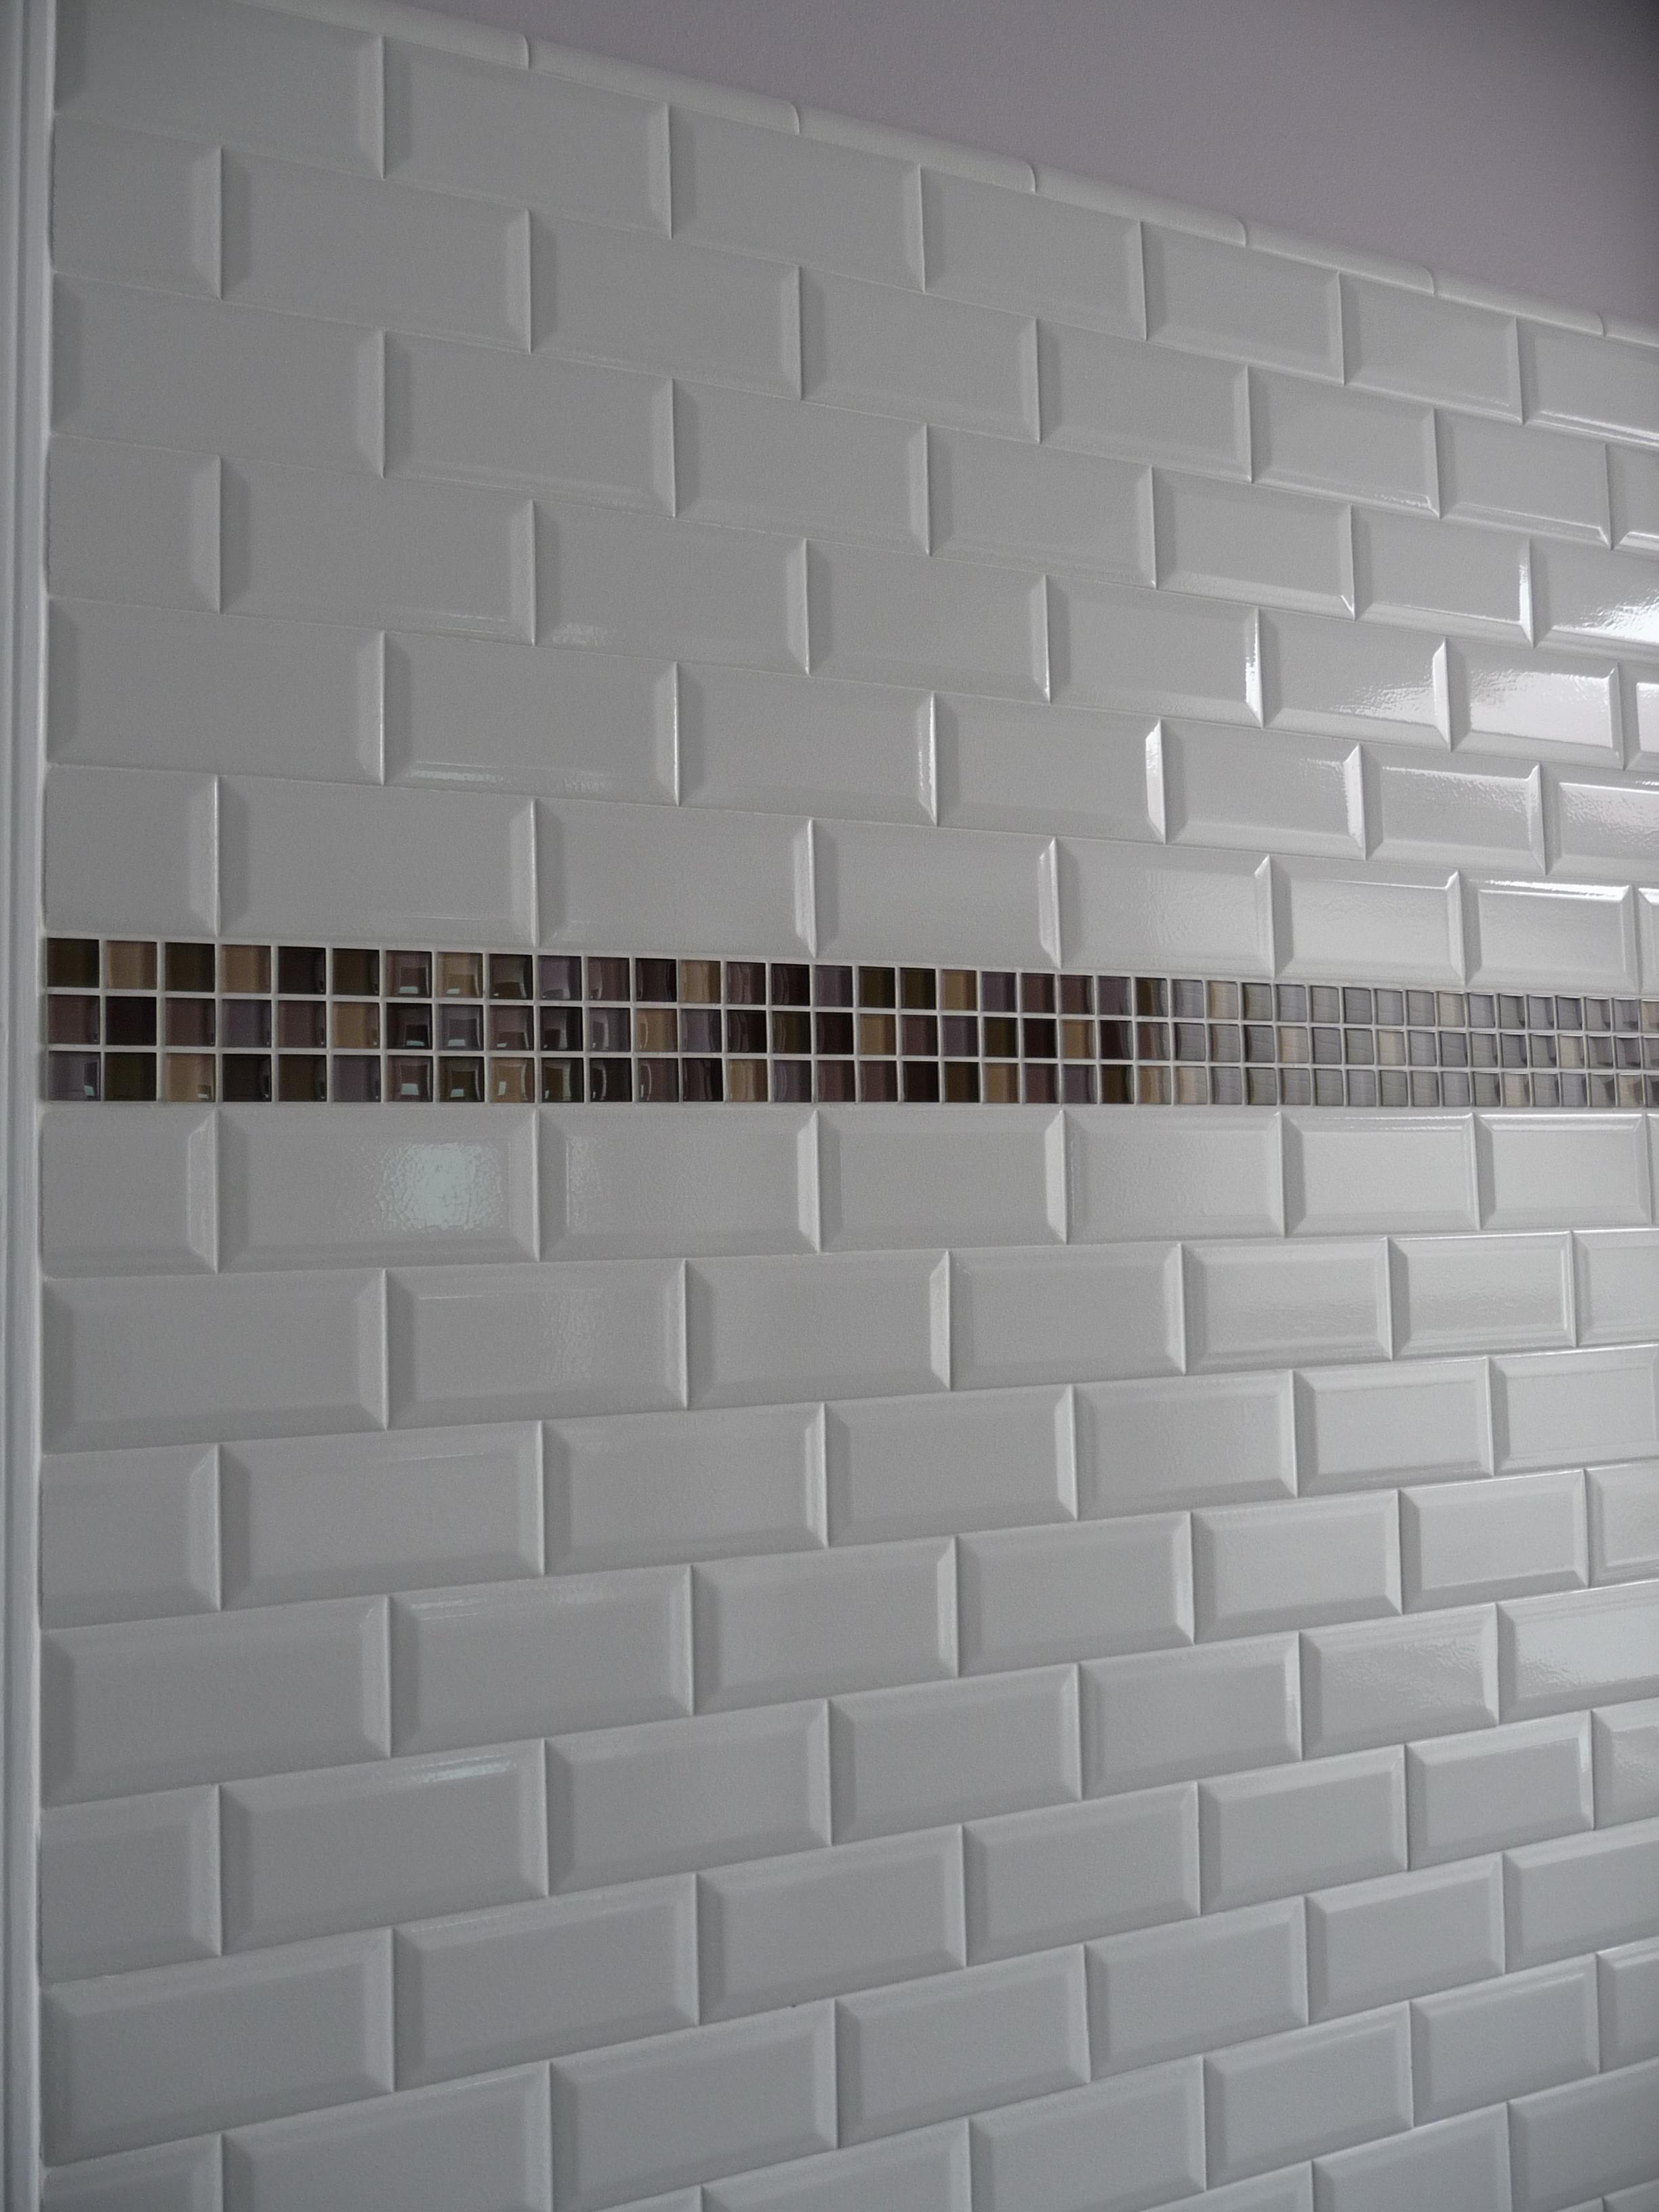 Nc225142 ocean blue gloss subway wall tiles brisbane subway wall nc225142 ocean blue gloss subway wall tiles brisbane subway wall tiles pinterest wall tiles and walls dailygadgetfo Gallery